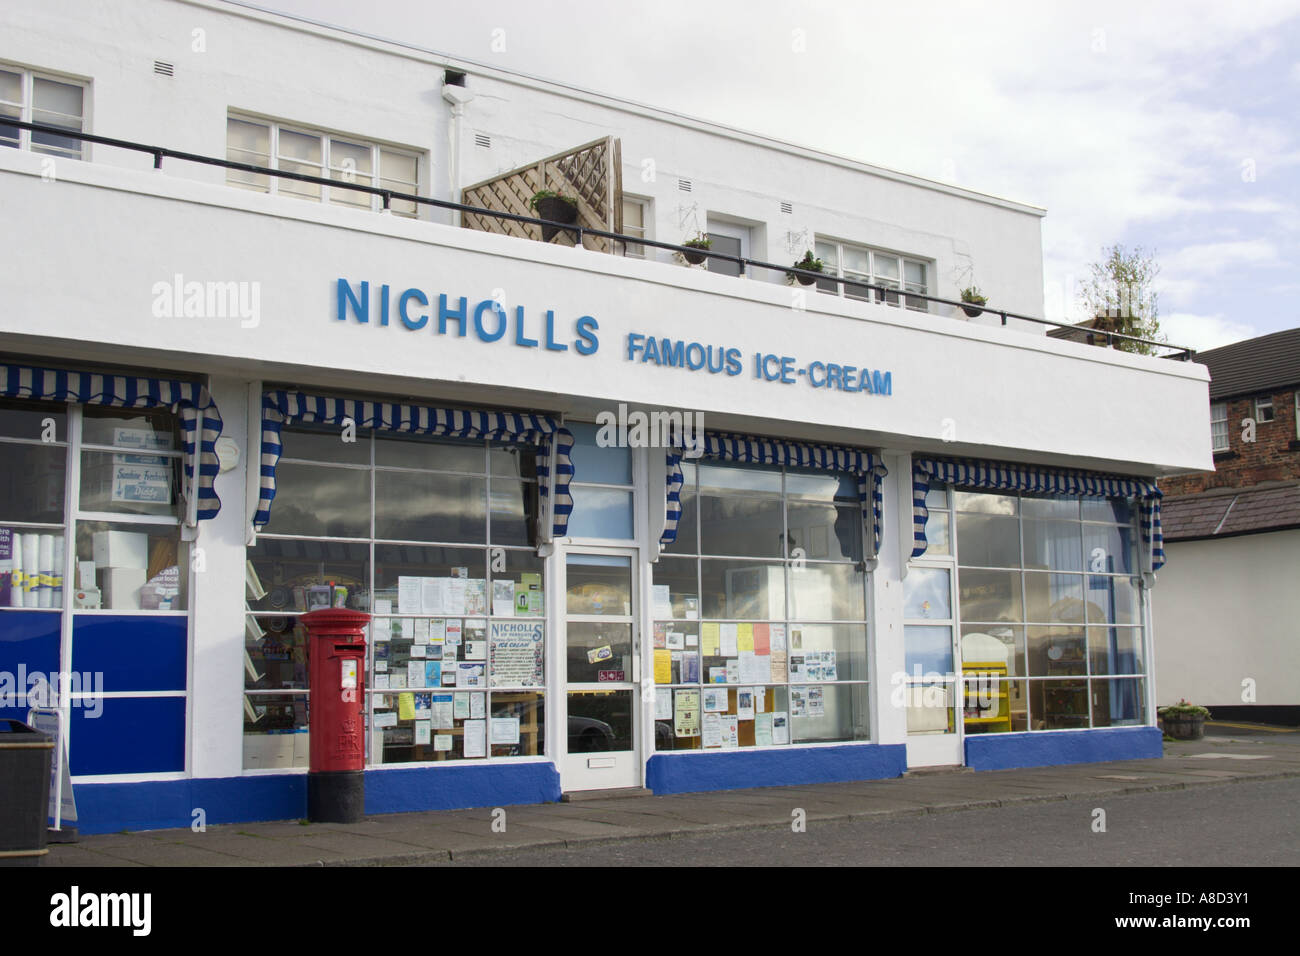 Nicholls Famous Ice-Cream shop, Parkgate, Wirral - Stock Image